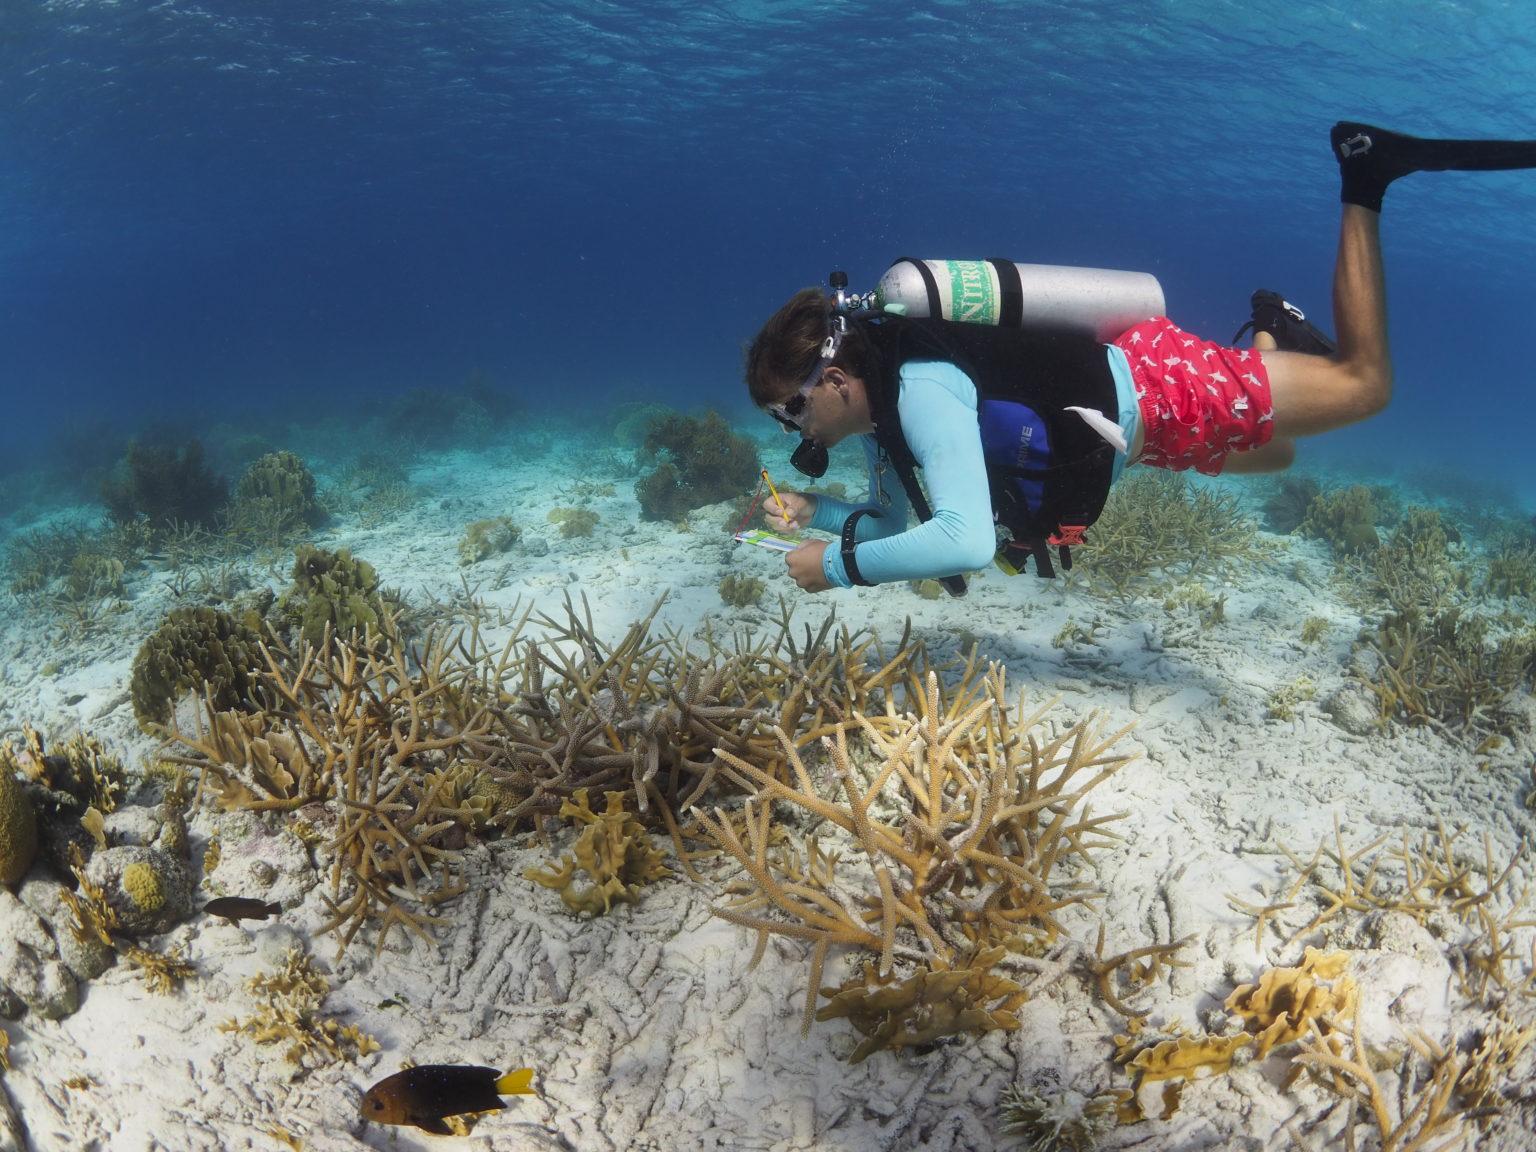 Sander counting marine life